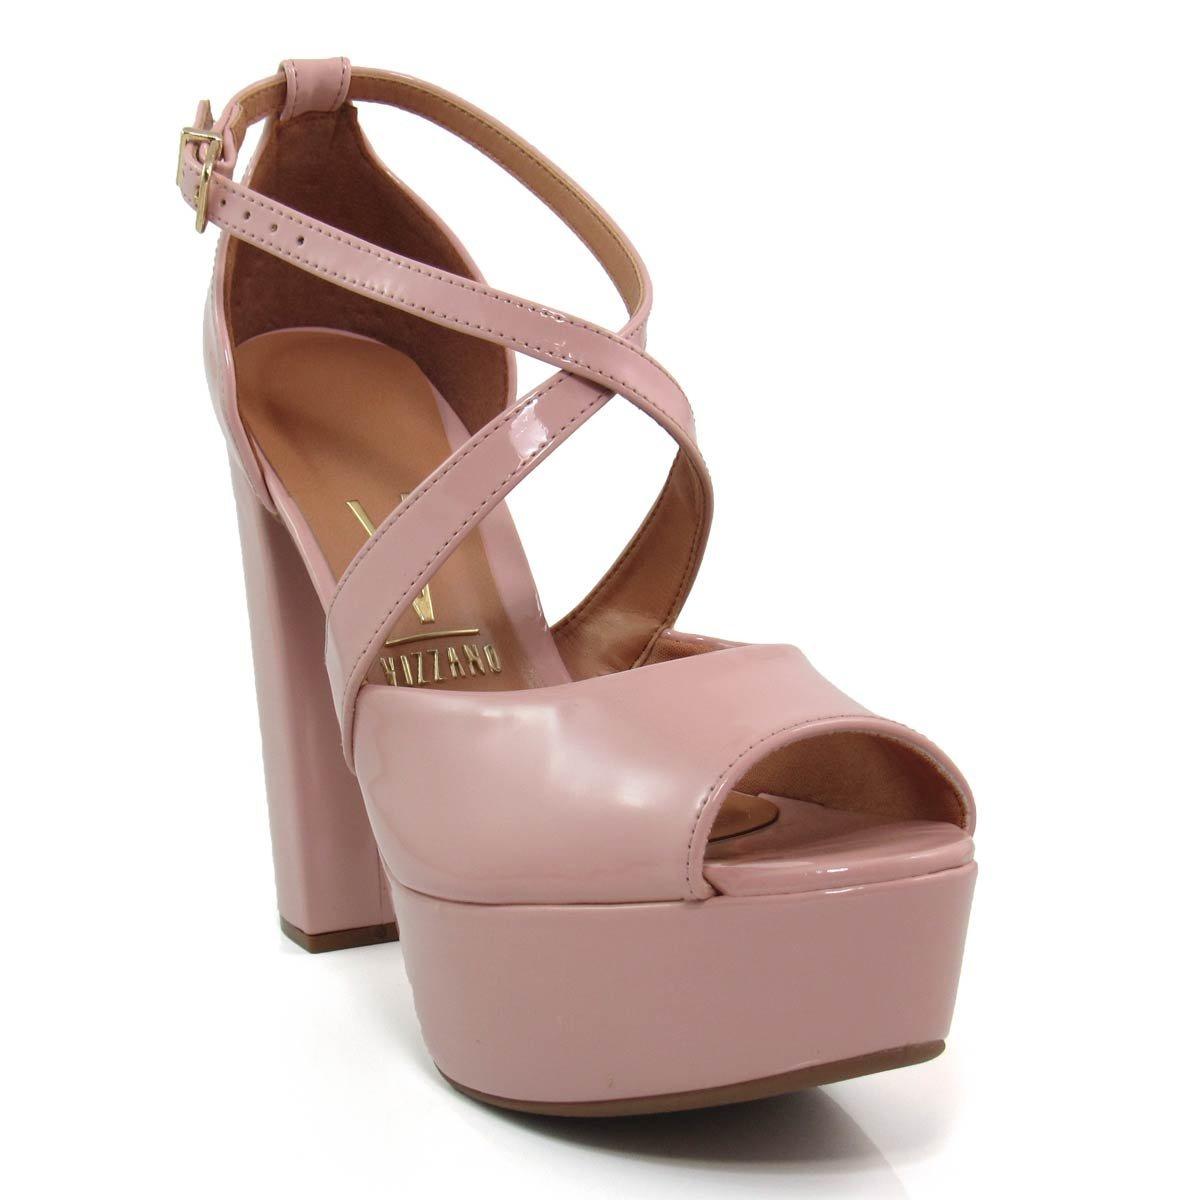 6392c6e33 sandália feminina meia pata salto grosso vizzano 6282136. Carregando zoom.